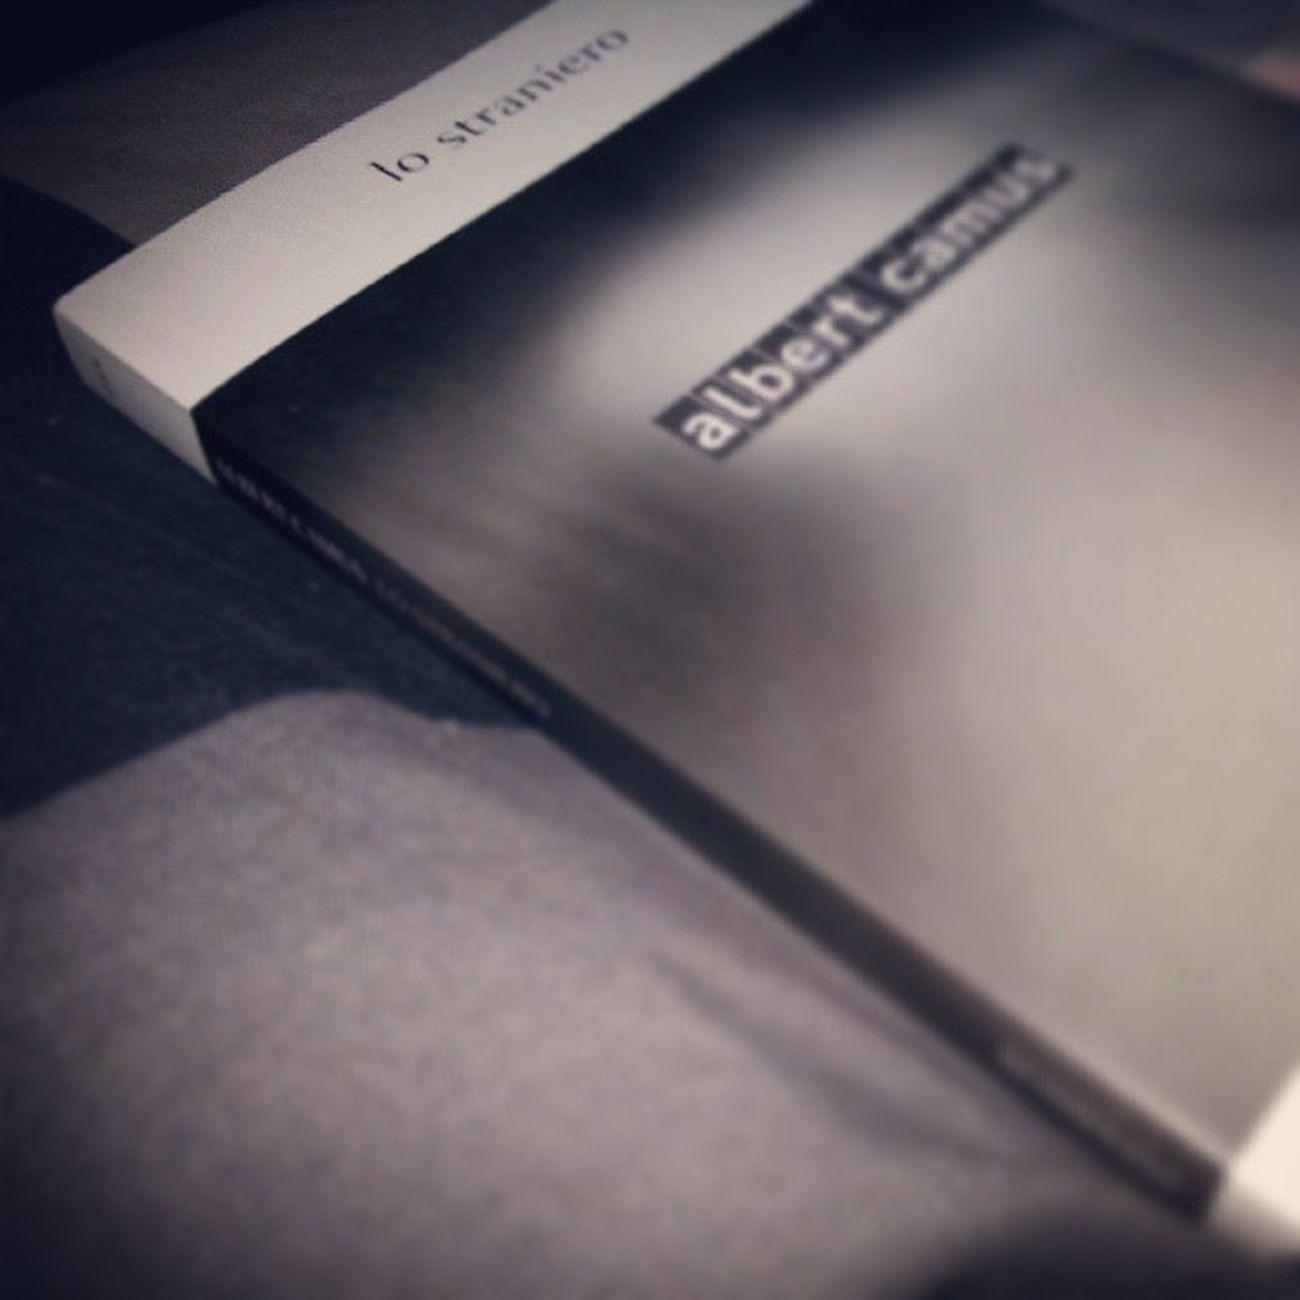 Camus+piumone+Yiruma Chi m'ammazza! Camus Lostraniero Booksandmusic Piumone uccidimipure tantostobene